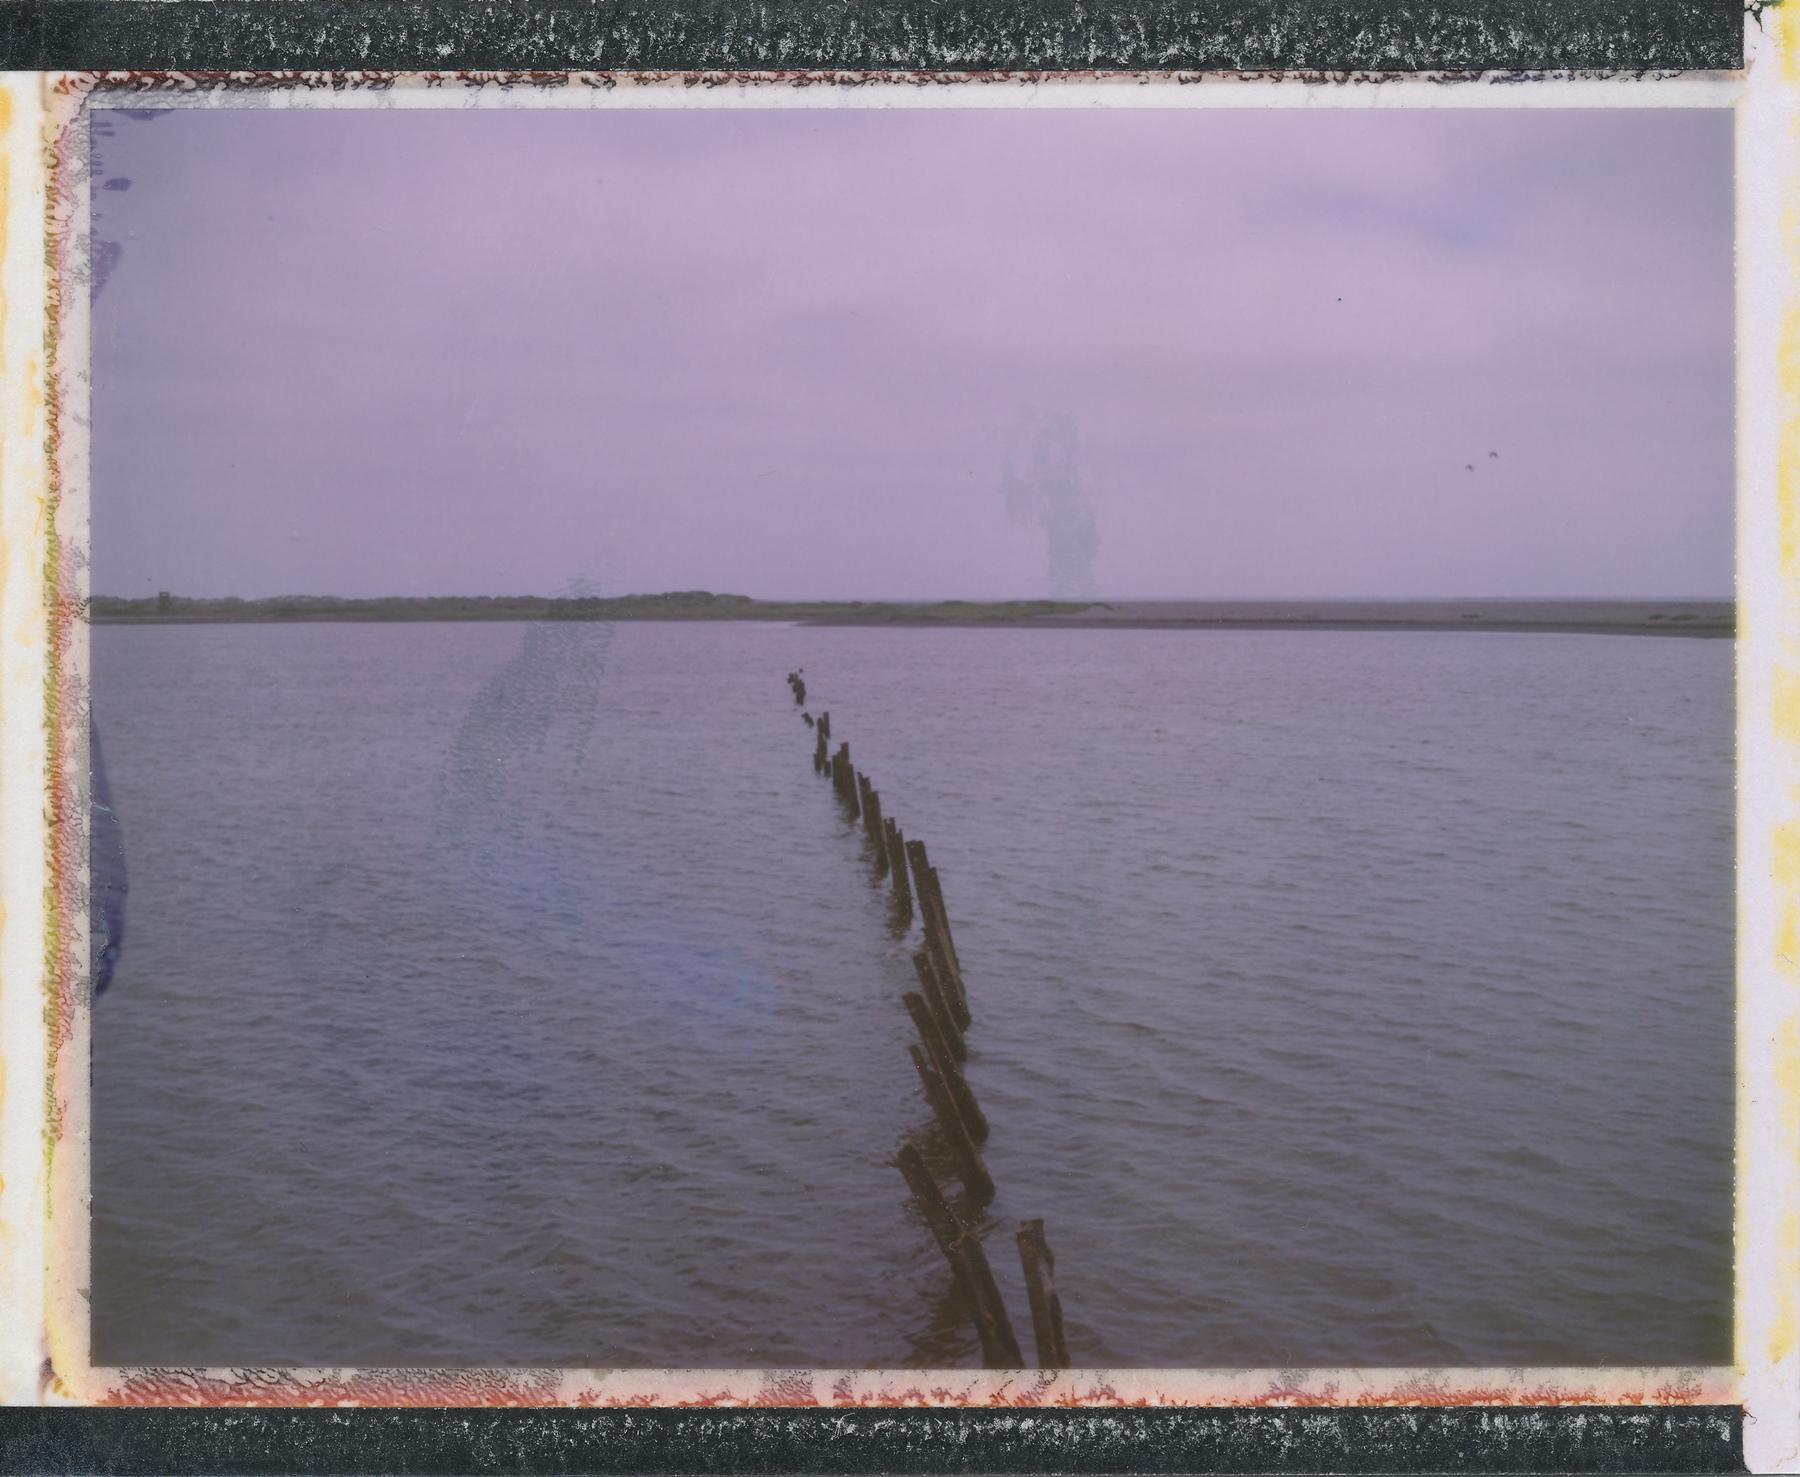 Untitled | Polaroid Land Camera | Fuji FP100C | Celeste Ortiz